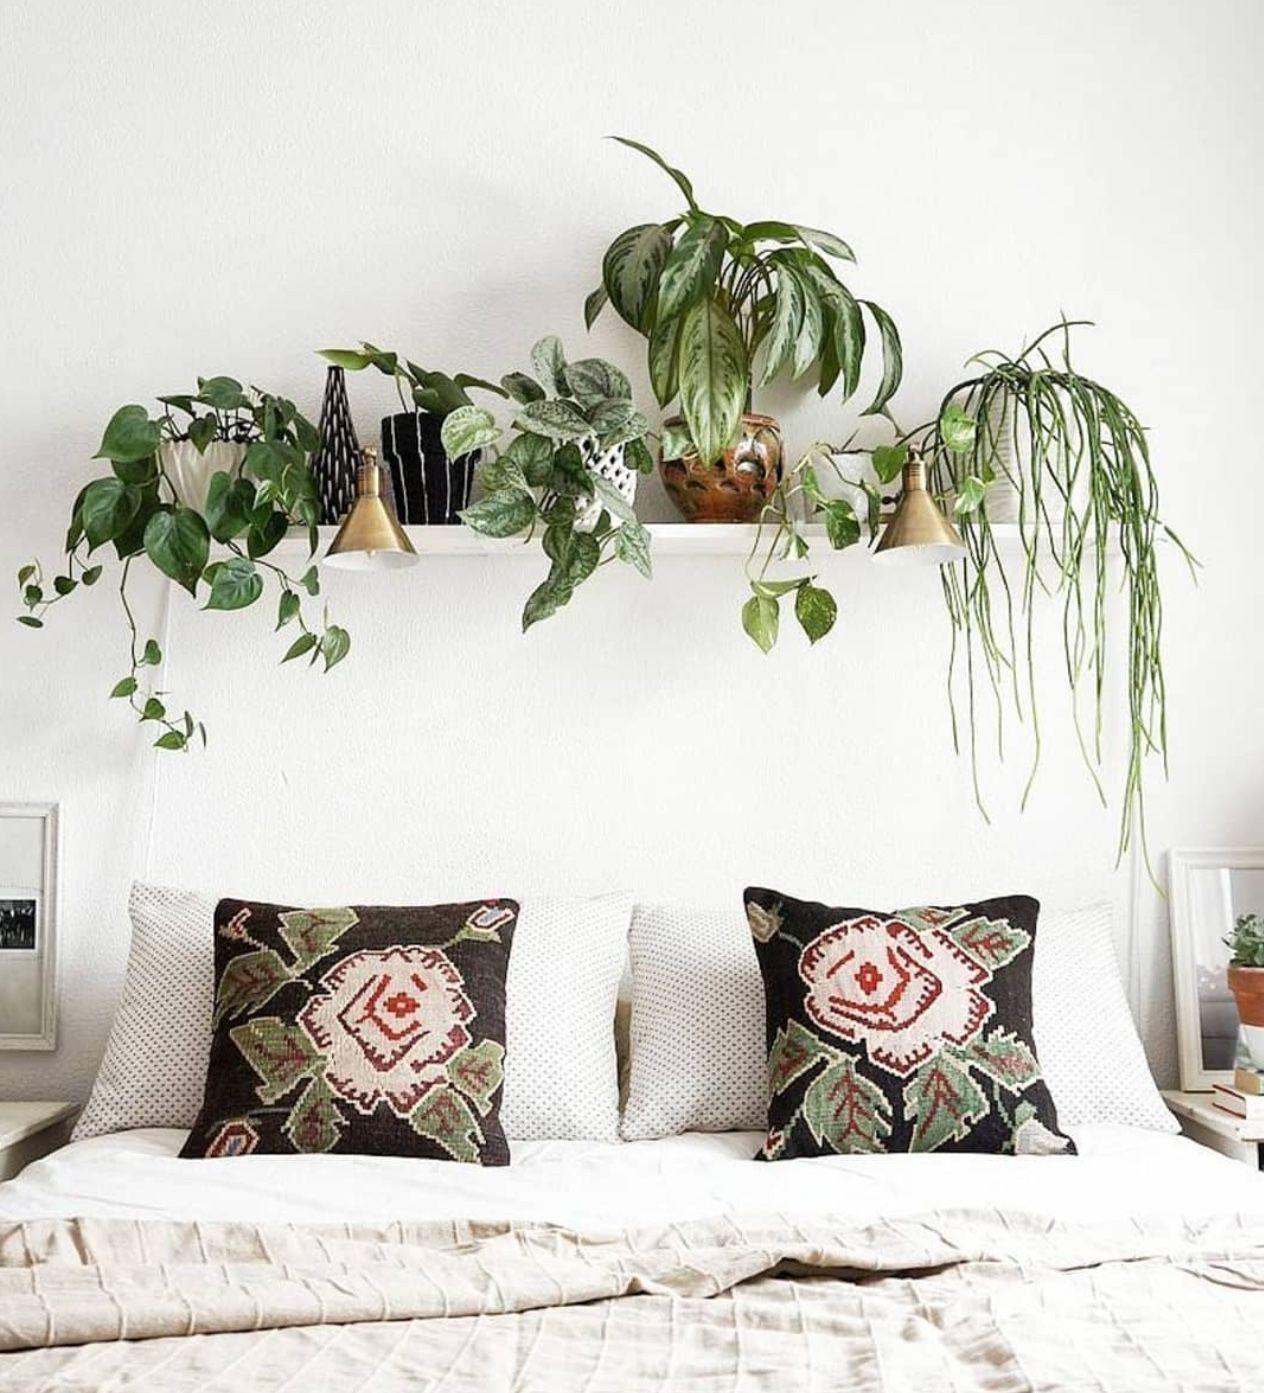 Pin By Ray C Molinar On Cvety Komnatnye Wall Decor Bedroom Bedroom Design Home Decor